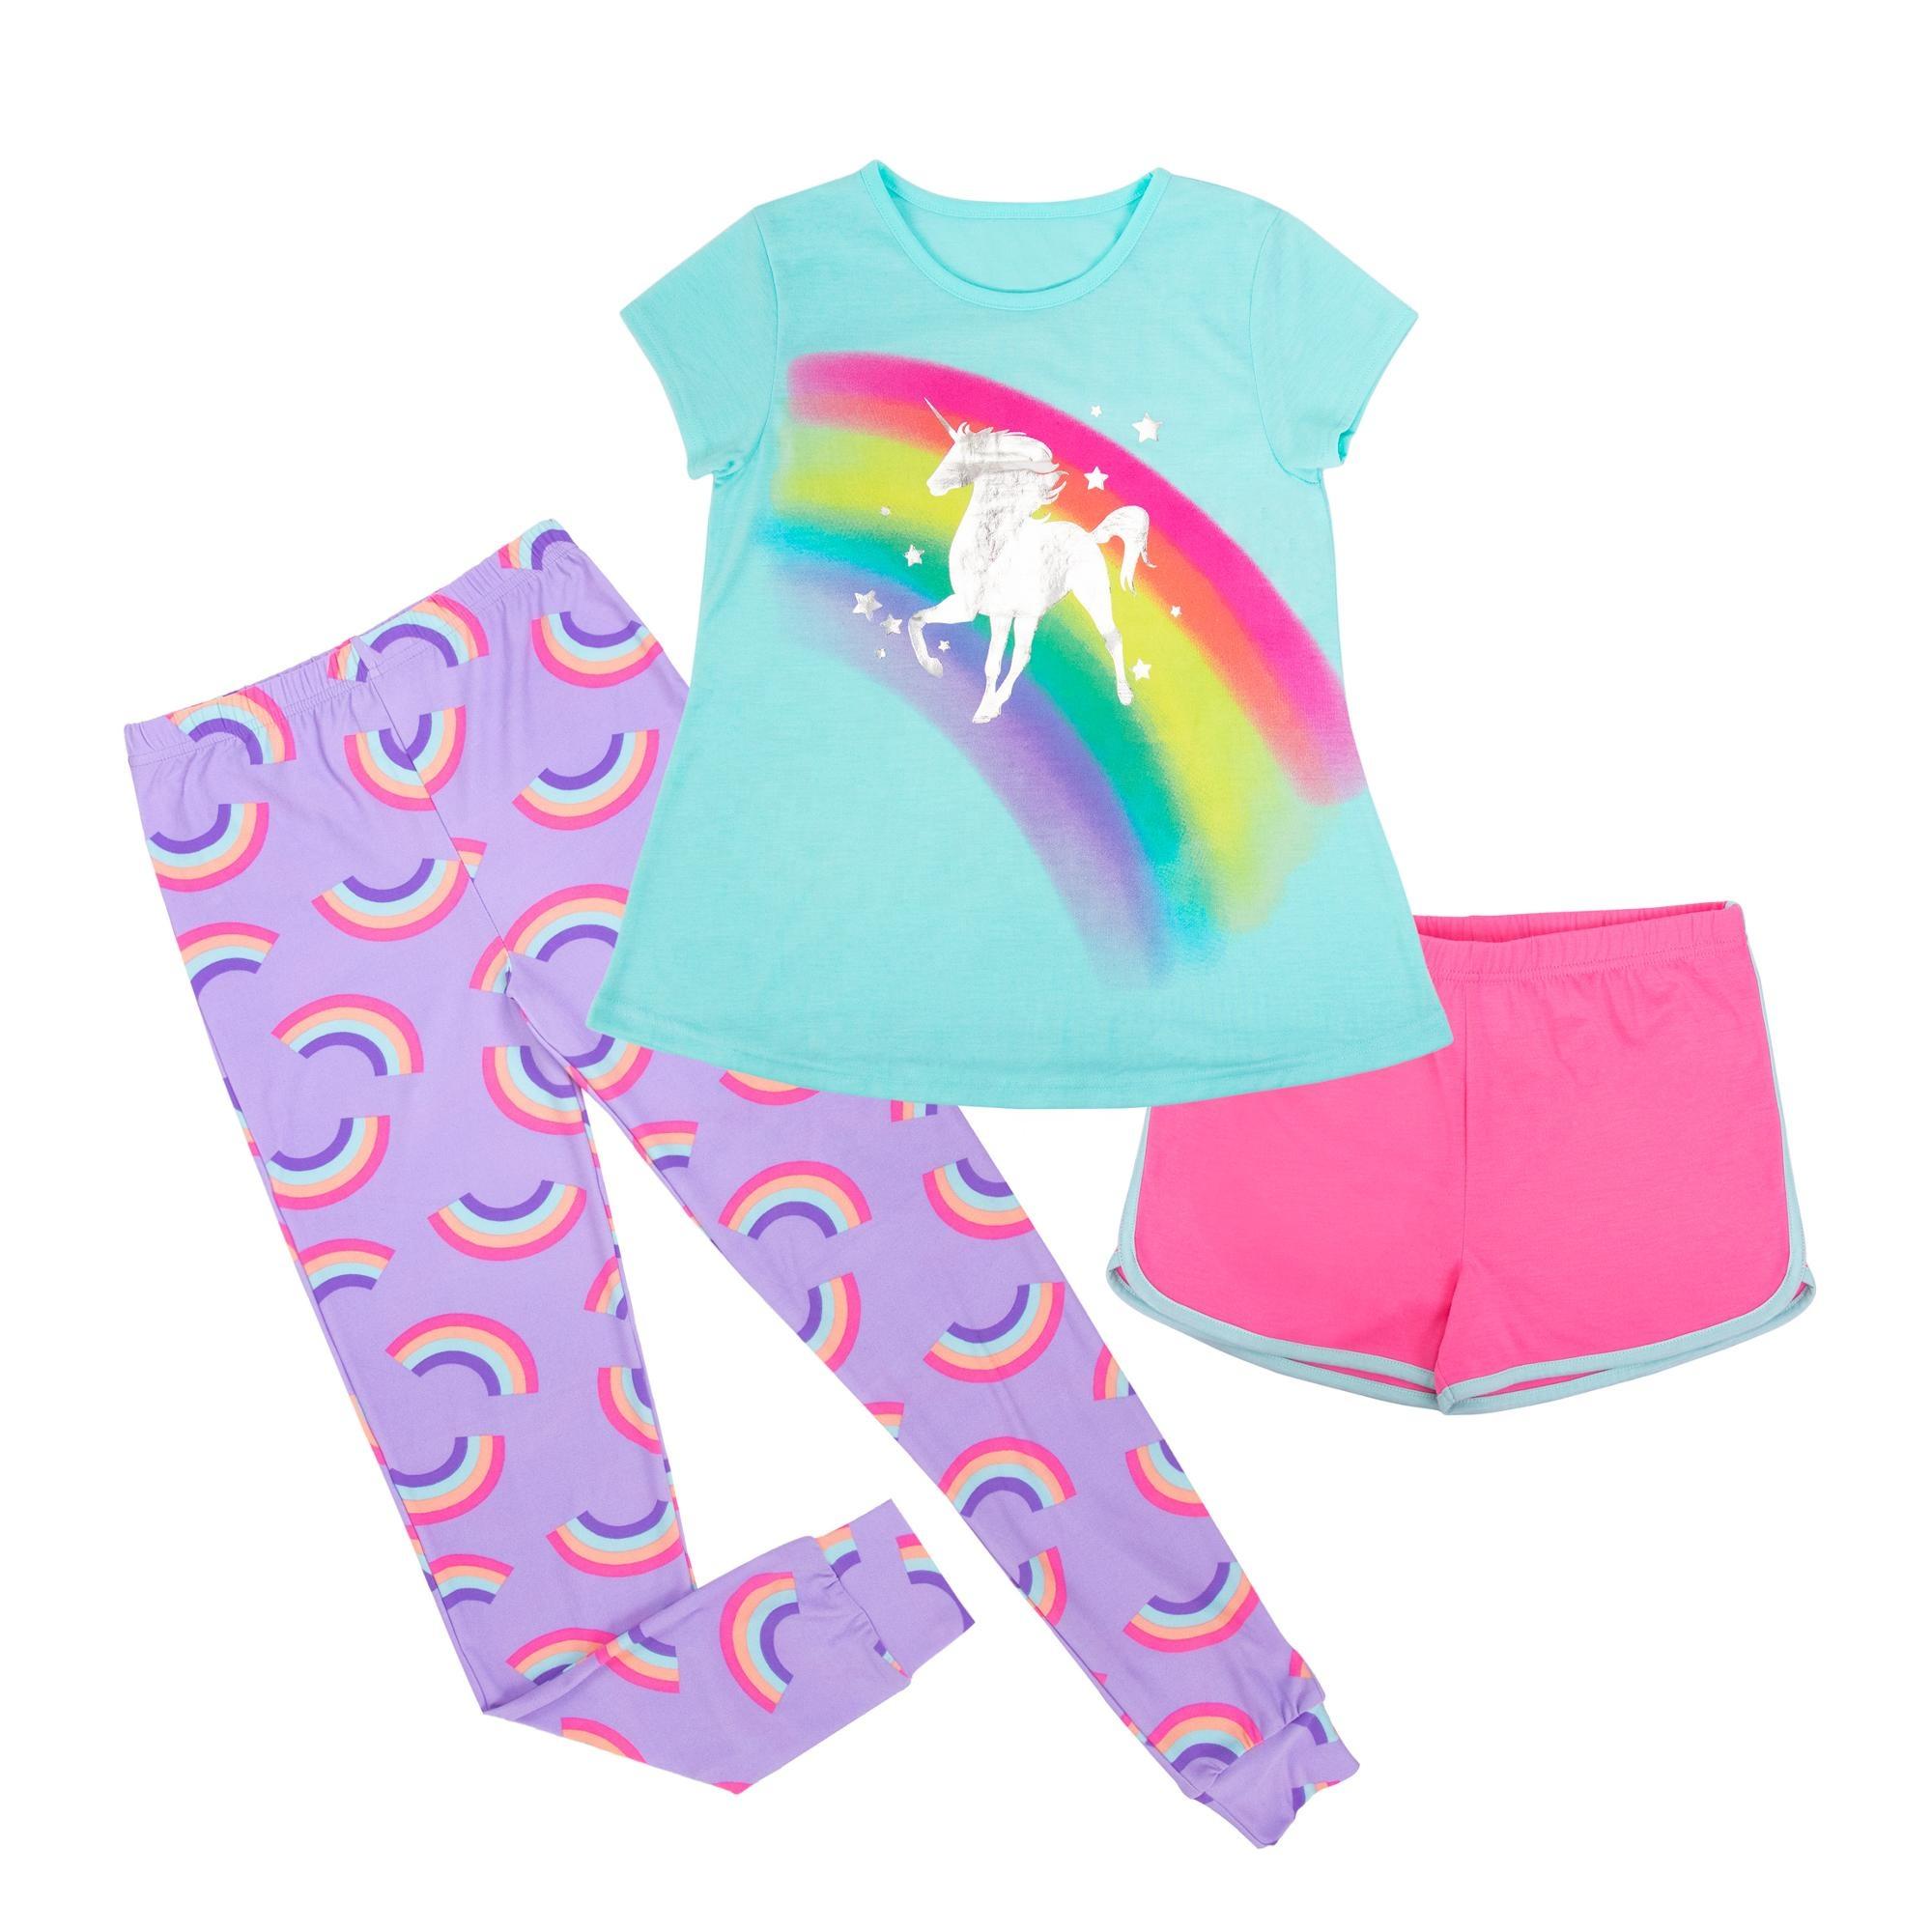 Muda Gadis Grafis Rainbow Unicorn Tee Shirt Seluruh Cetak Anak-anak Subur Celana Lounge OEM Anak-anak Pakaian Piyama FR Baju Tidur